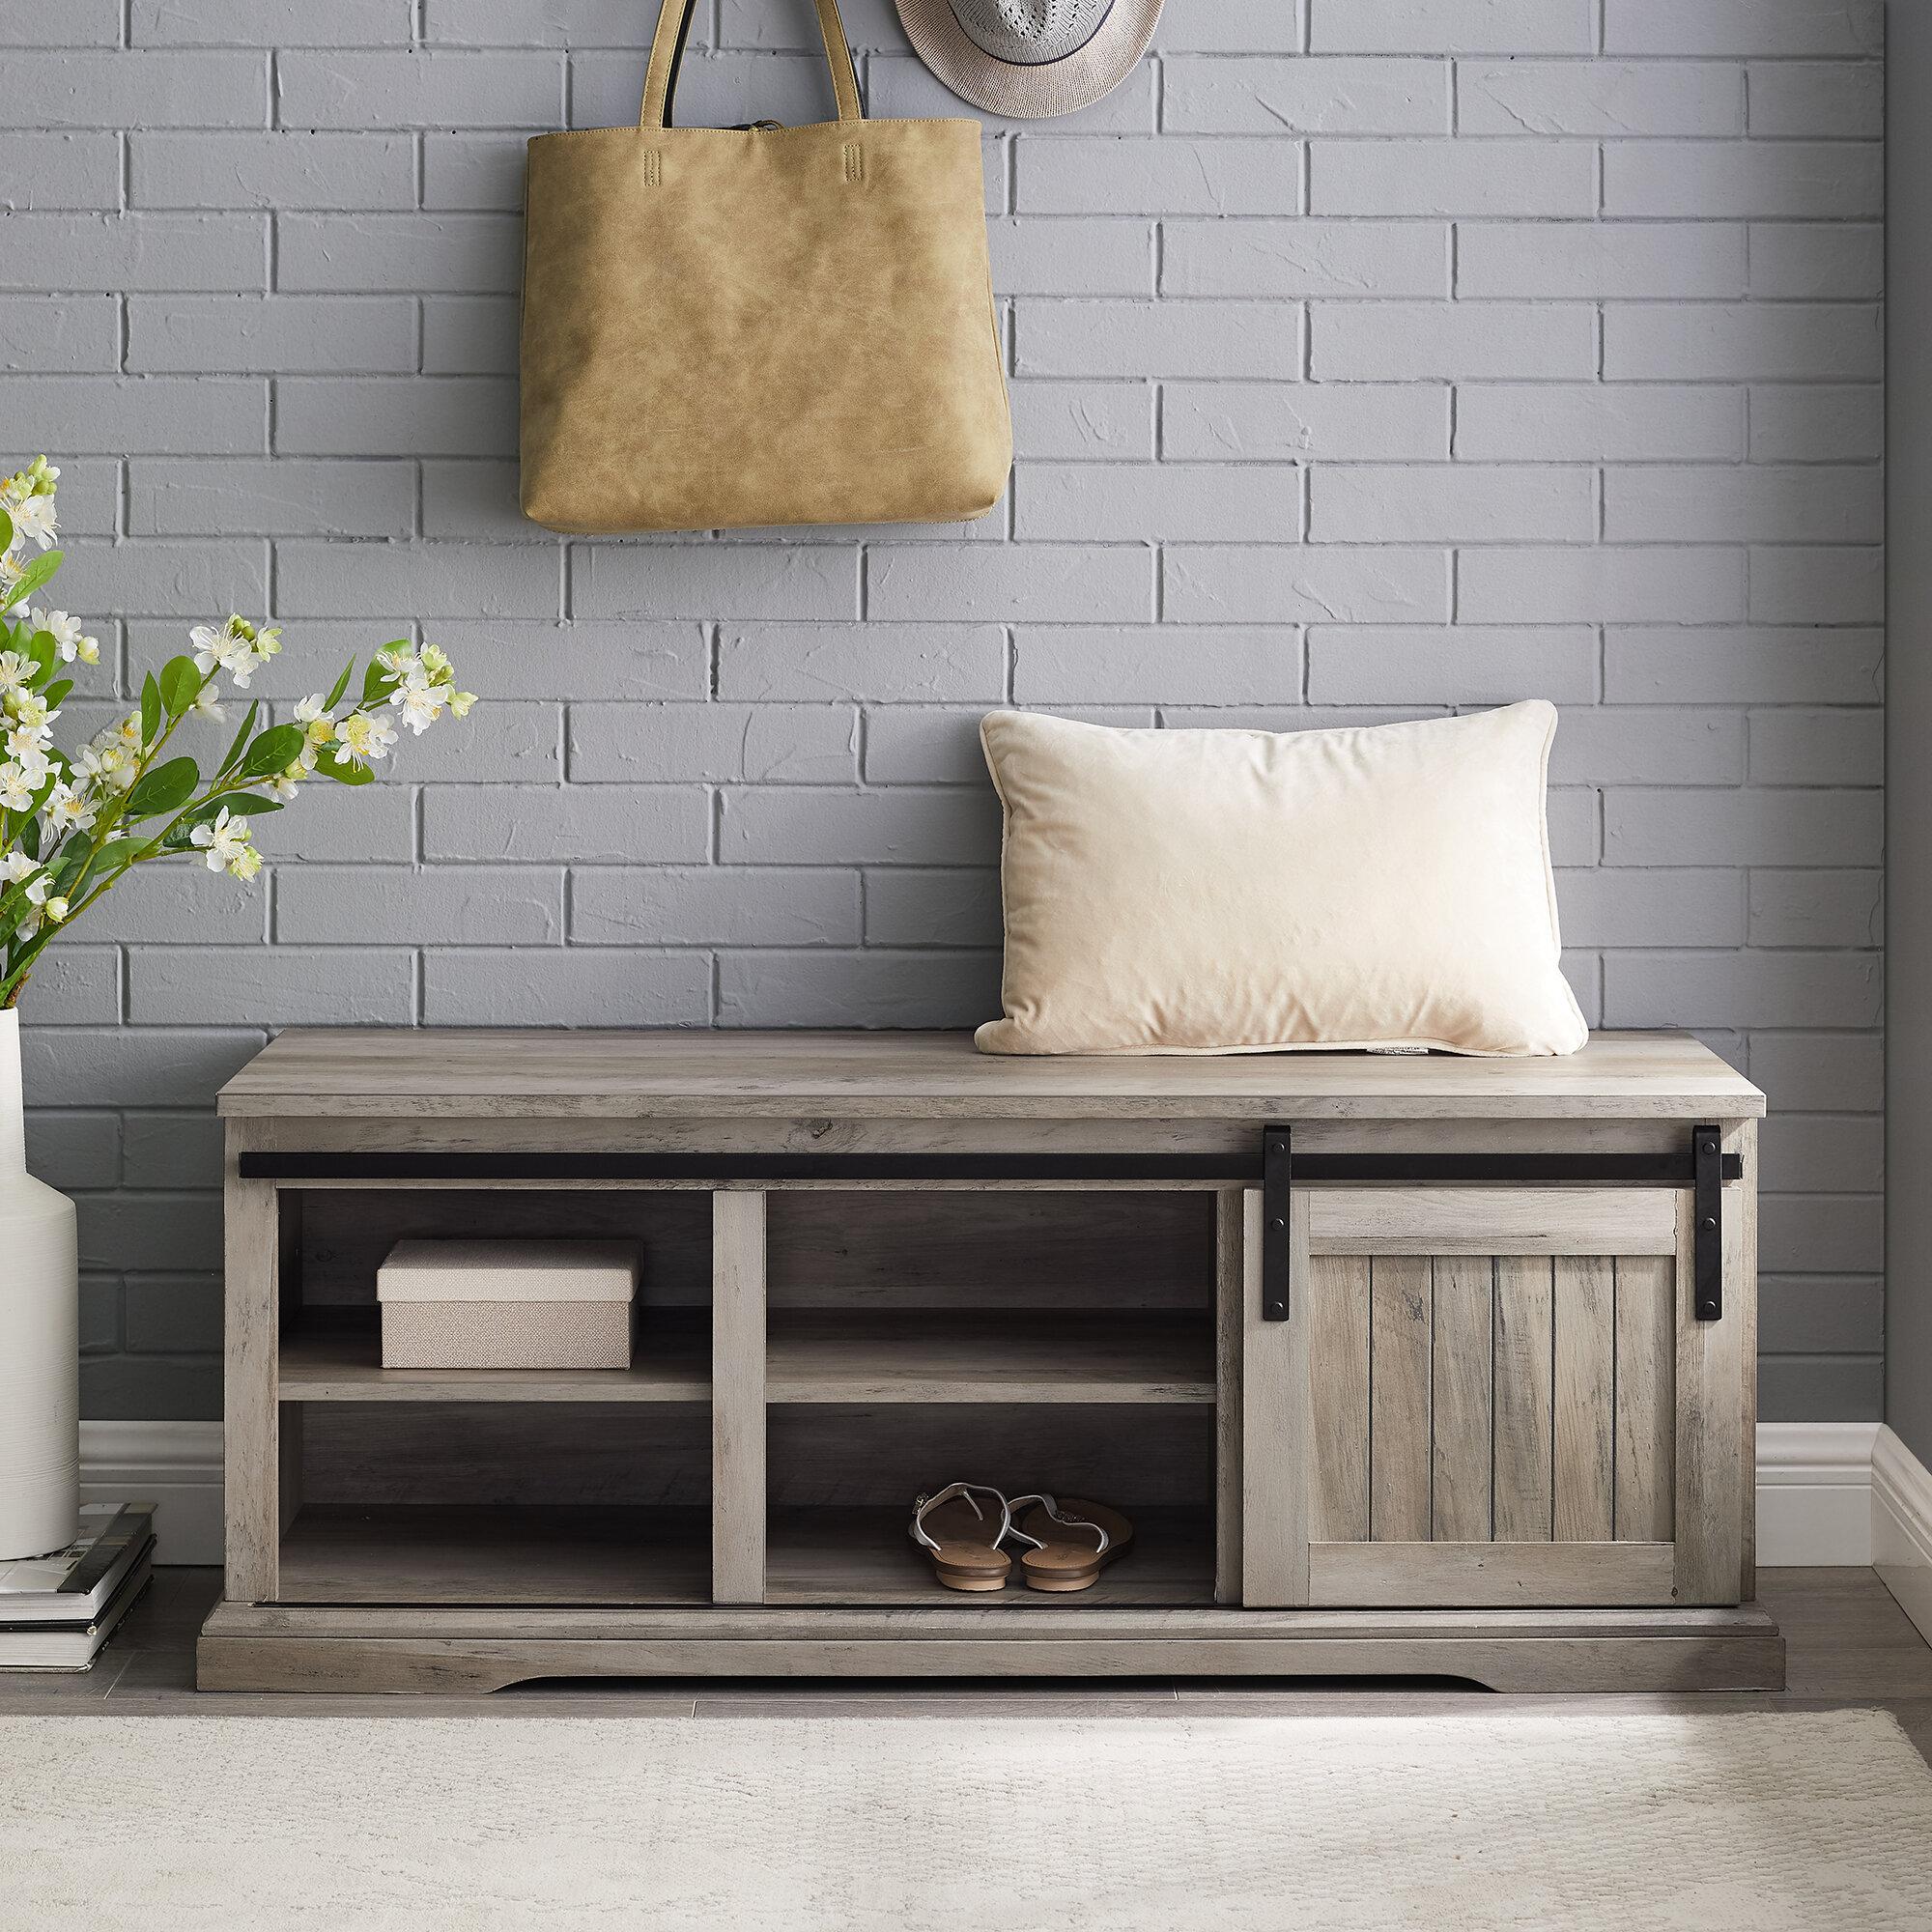 Gracie Oaks Shreffler Shoe Storage Bench Reviews Wayfair